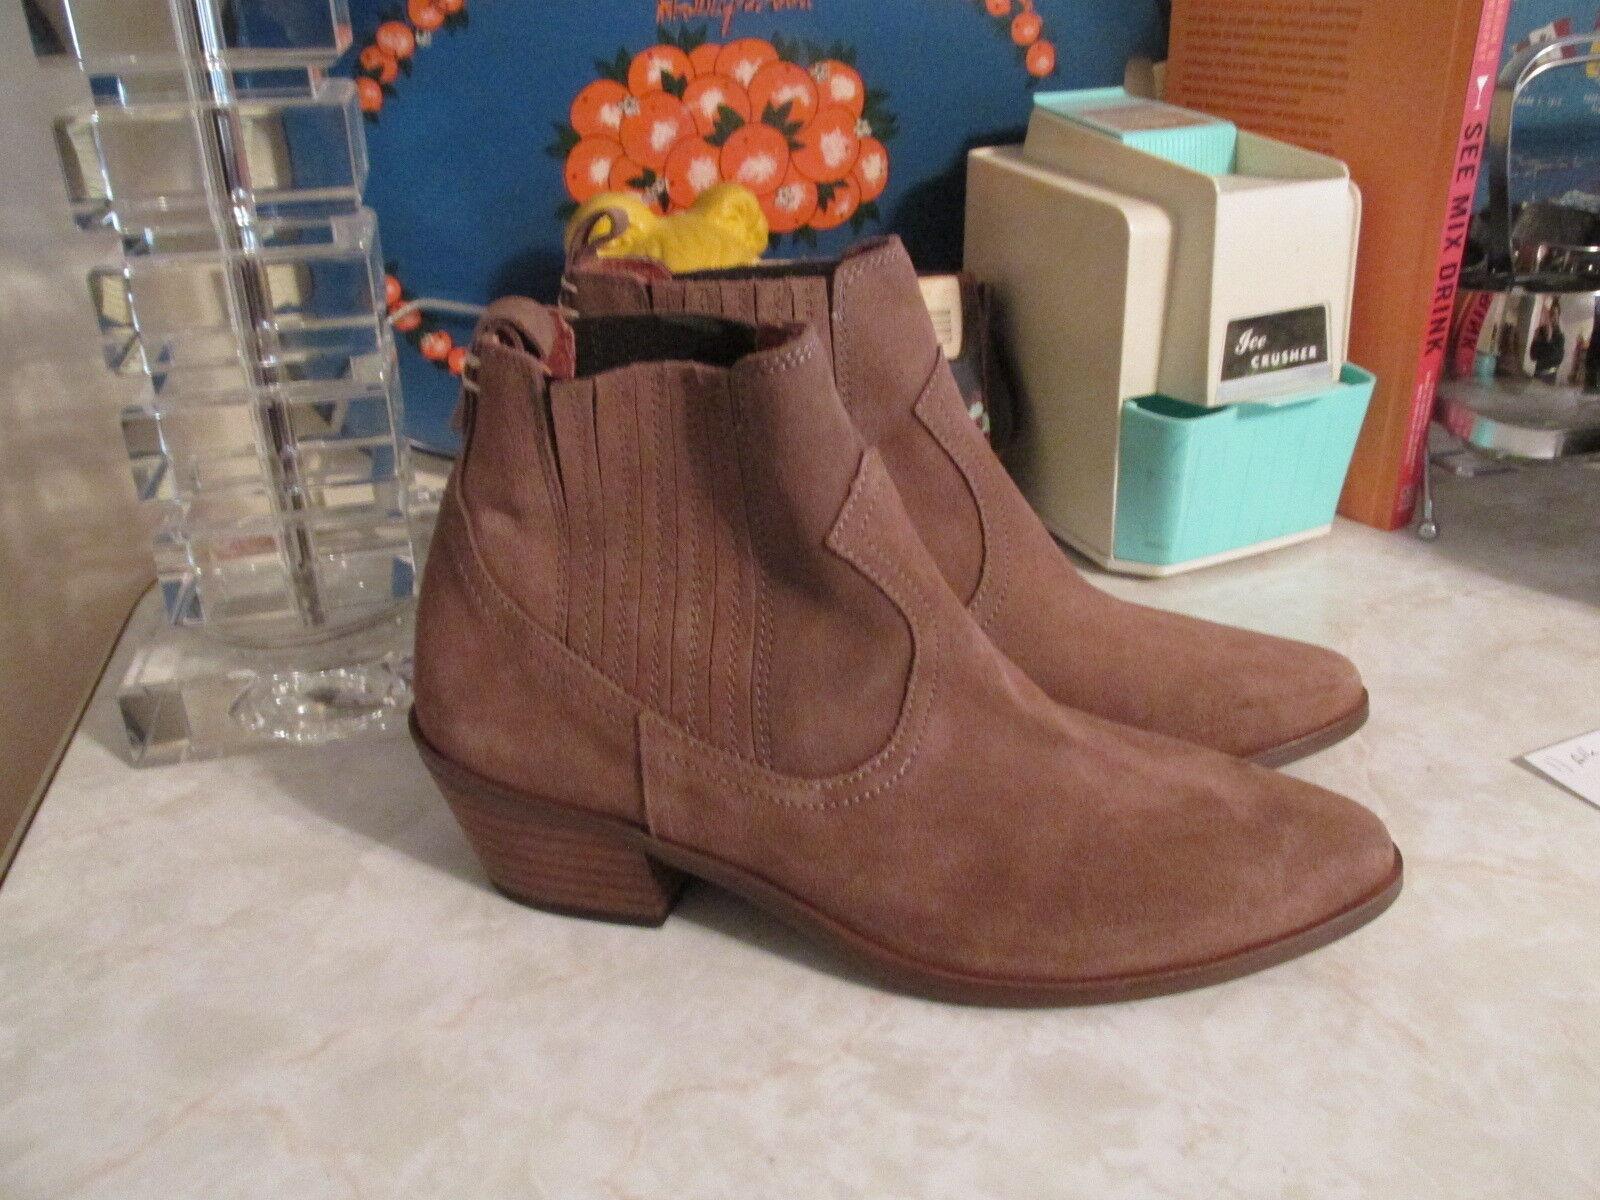 Urban Outfitters Crosswalk gamuza tobillo botas de estilo occidental talla talla talla EU 40 nos 10 Nuevo Sin Caja  muchas concesiones